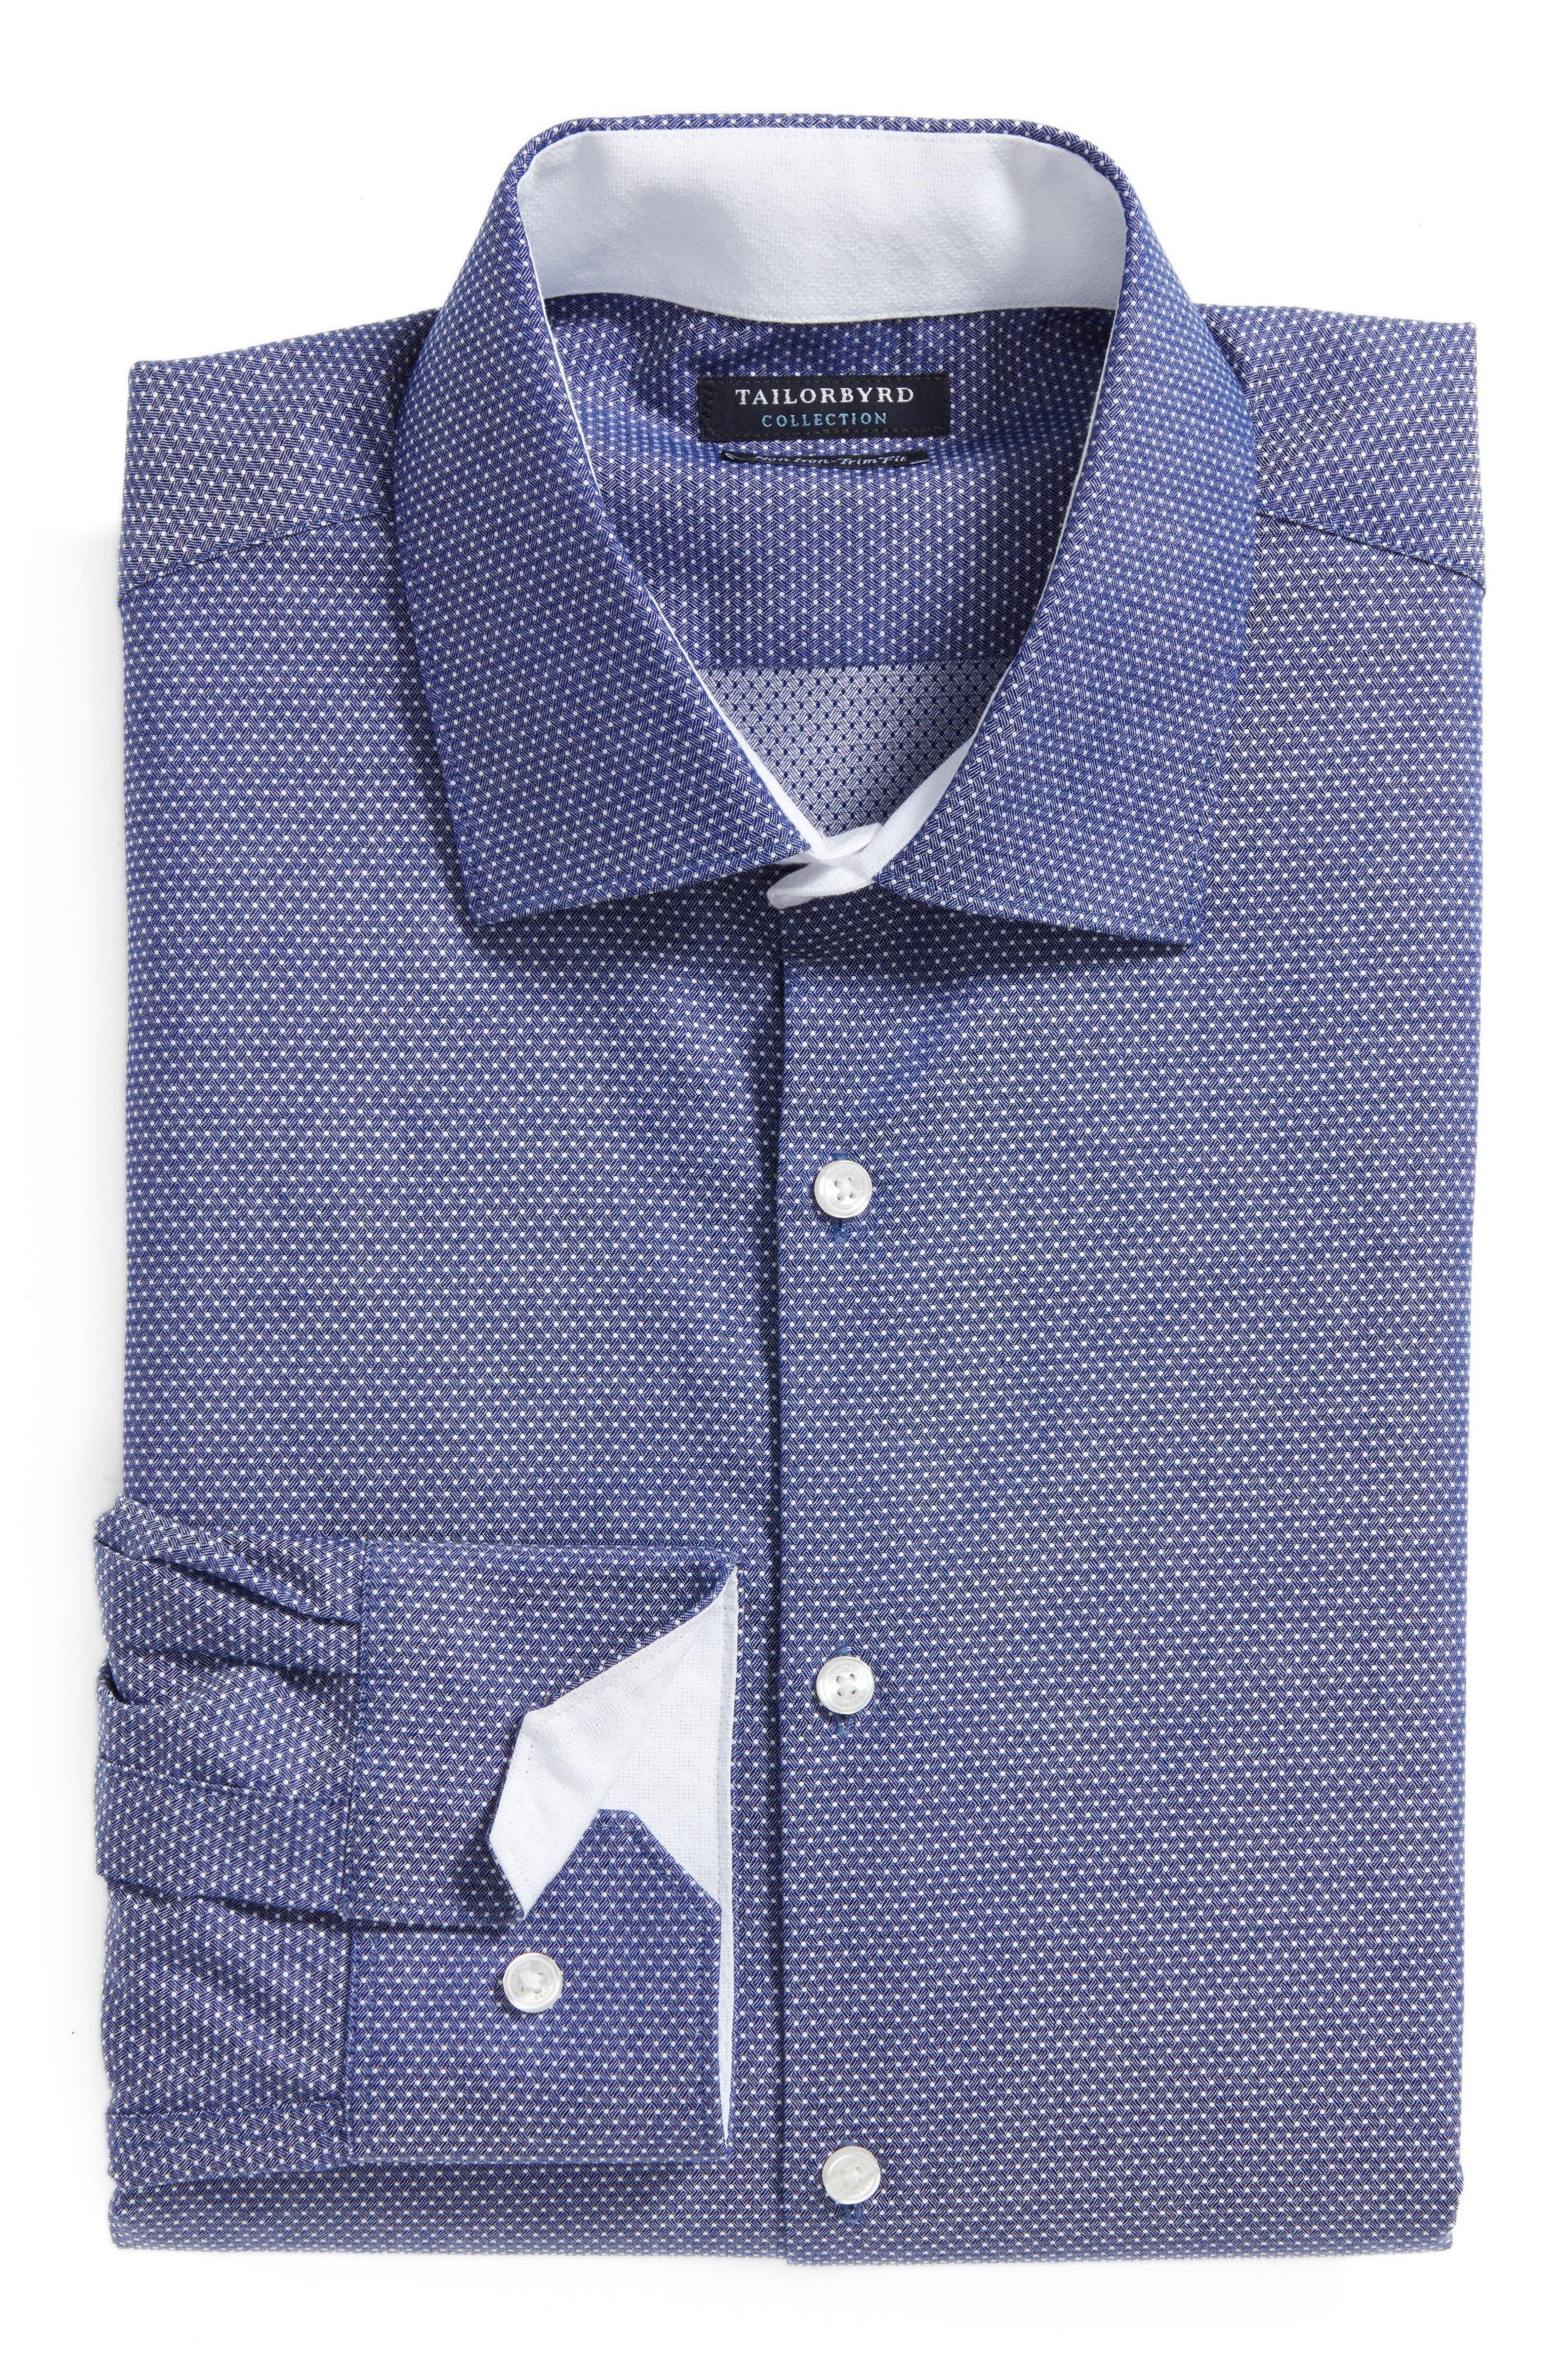 Main Image - Tailorbyrd Eden Isle Trim Fit Non-Iron Geometric Dress Shirt